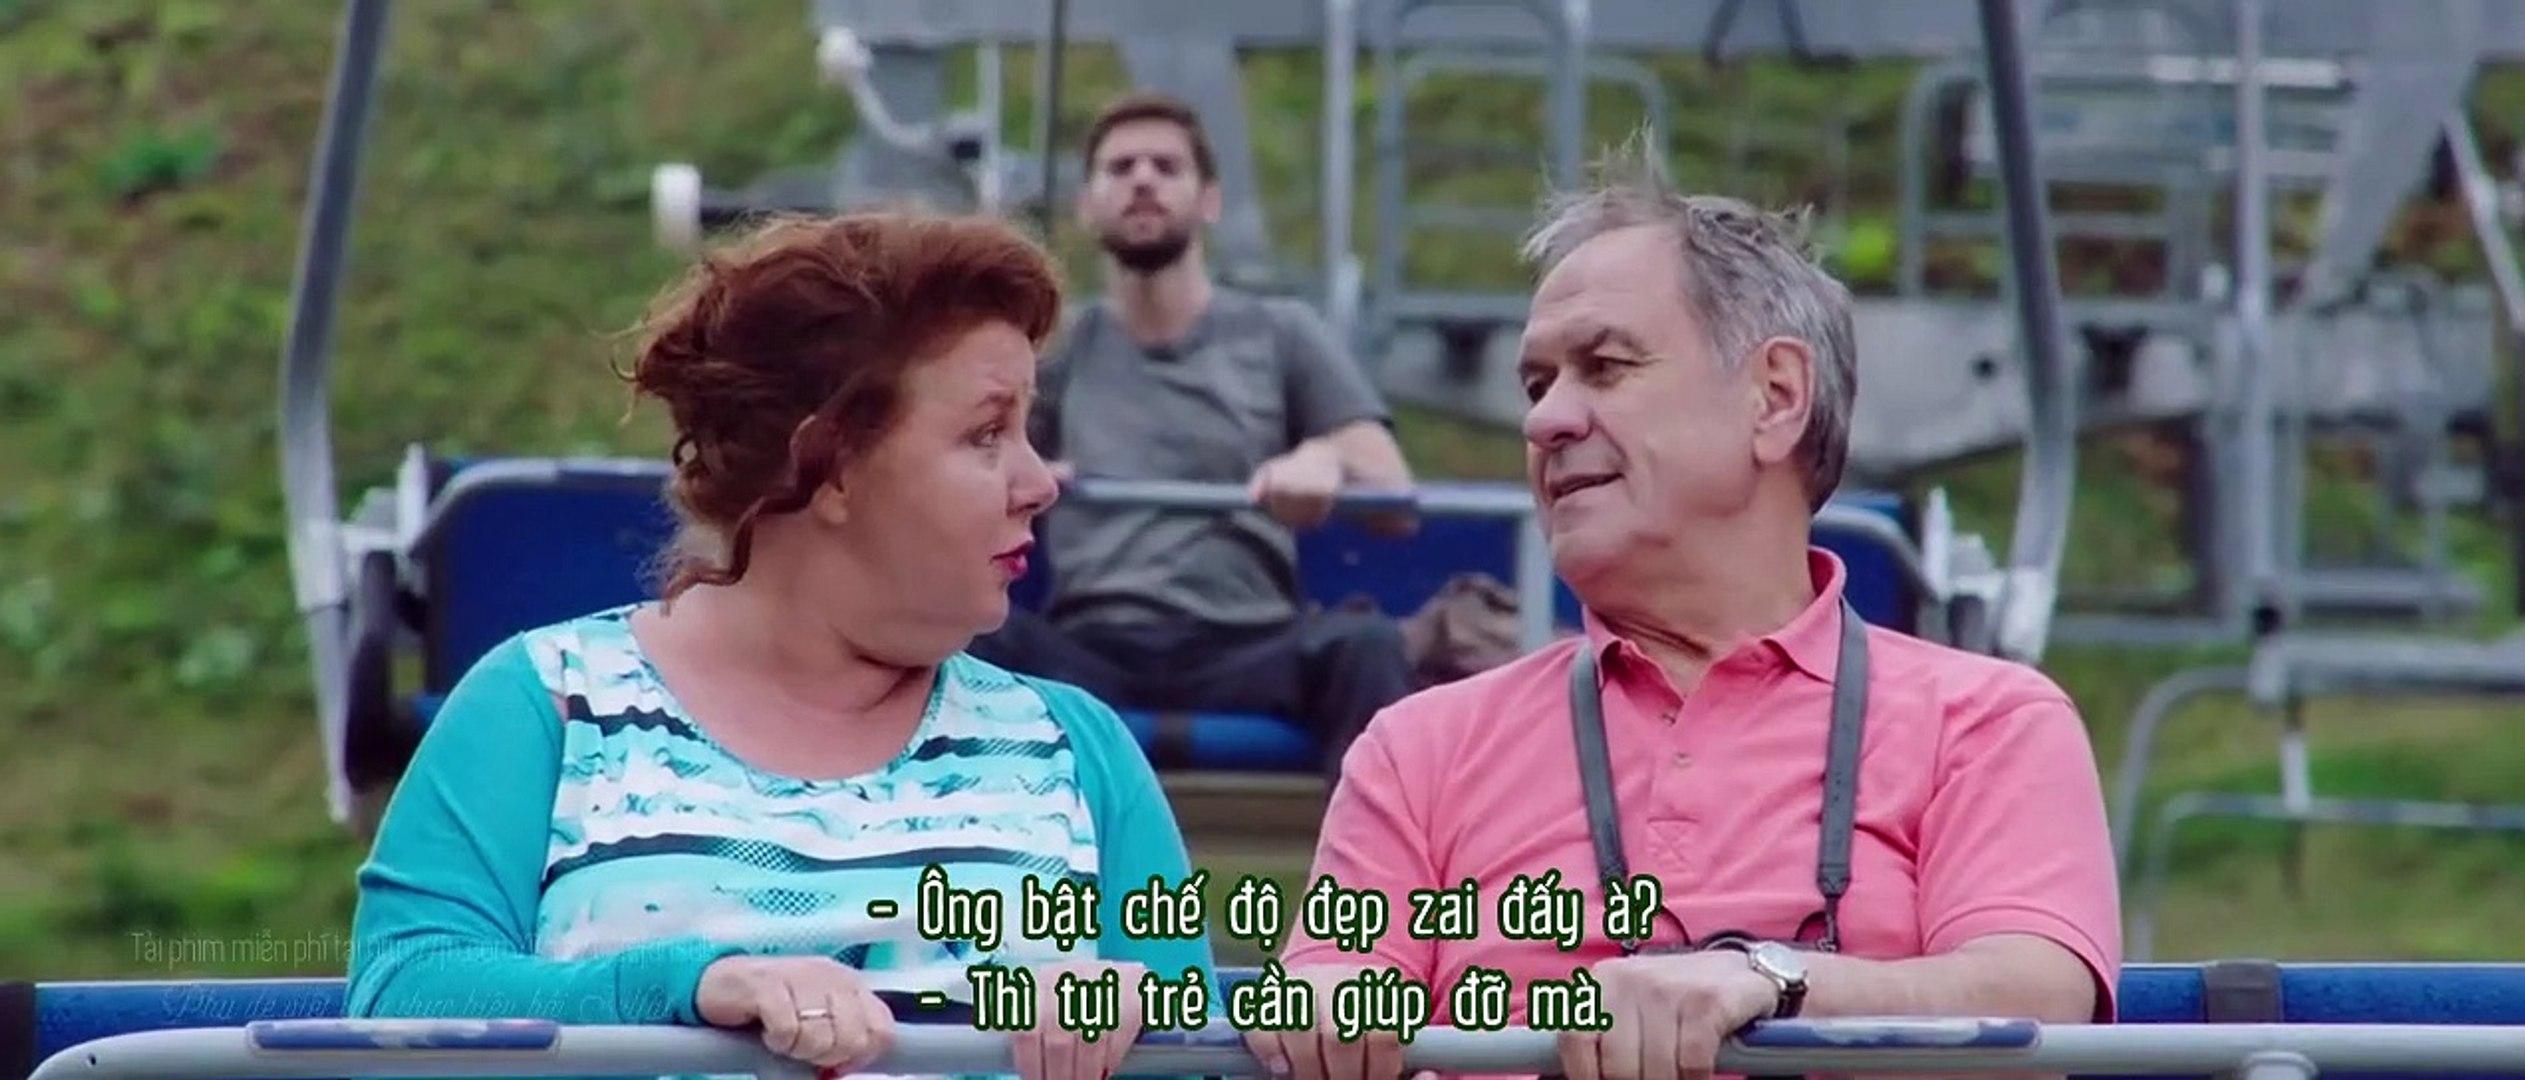 Kitchen - Cuộc chiến cuối cùng p3 (The last battle) (Кухня. Последняя битва)(2017)